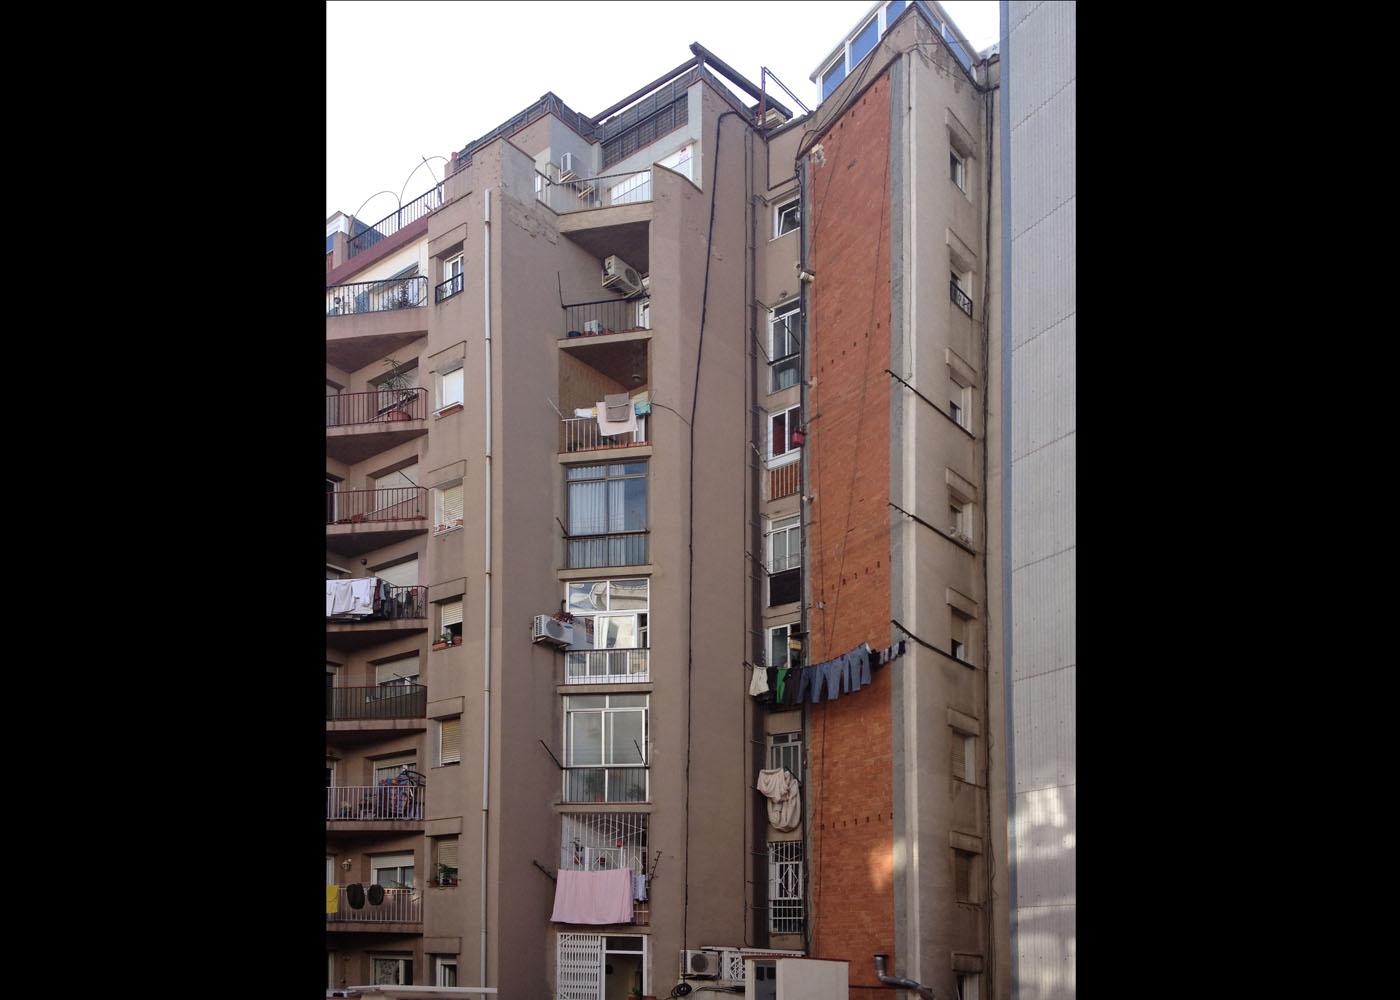 rehabilitacion-vivienda-plurifamiliar-passeig-de-lluis-companys-6-barcelona-02